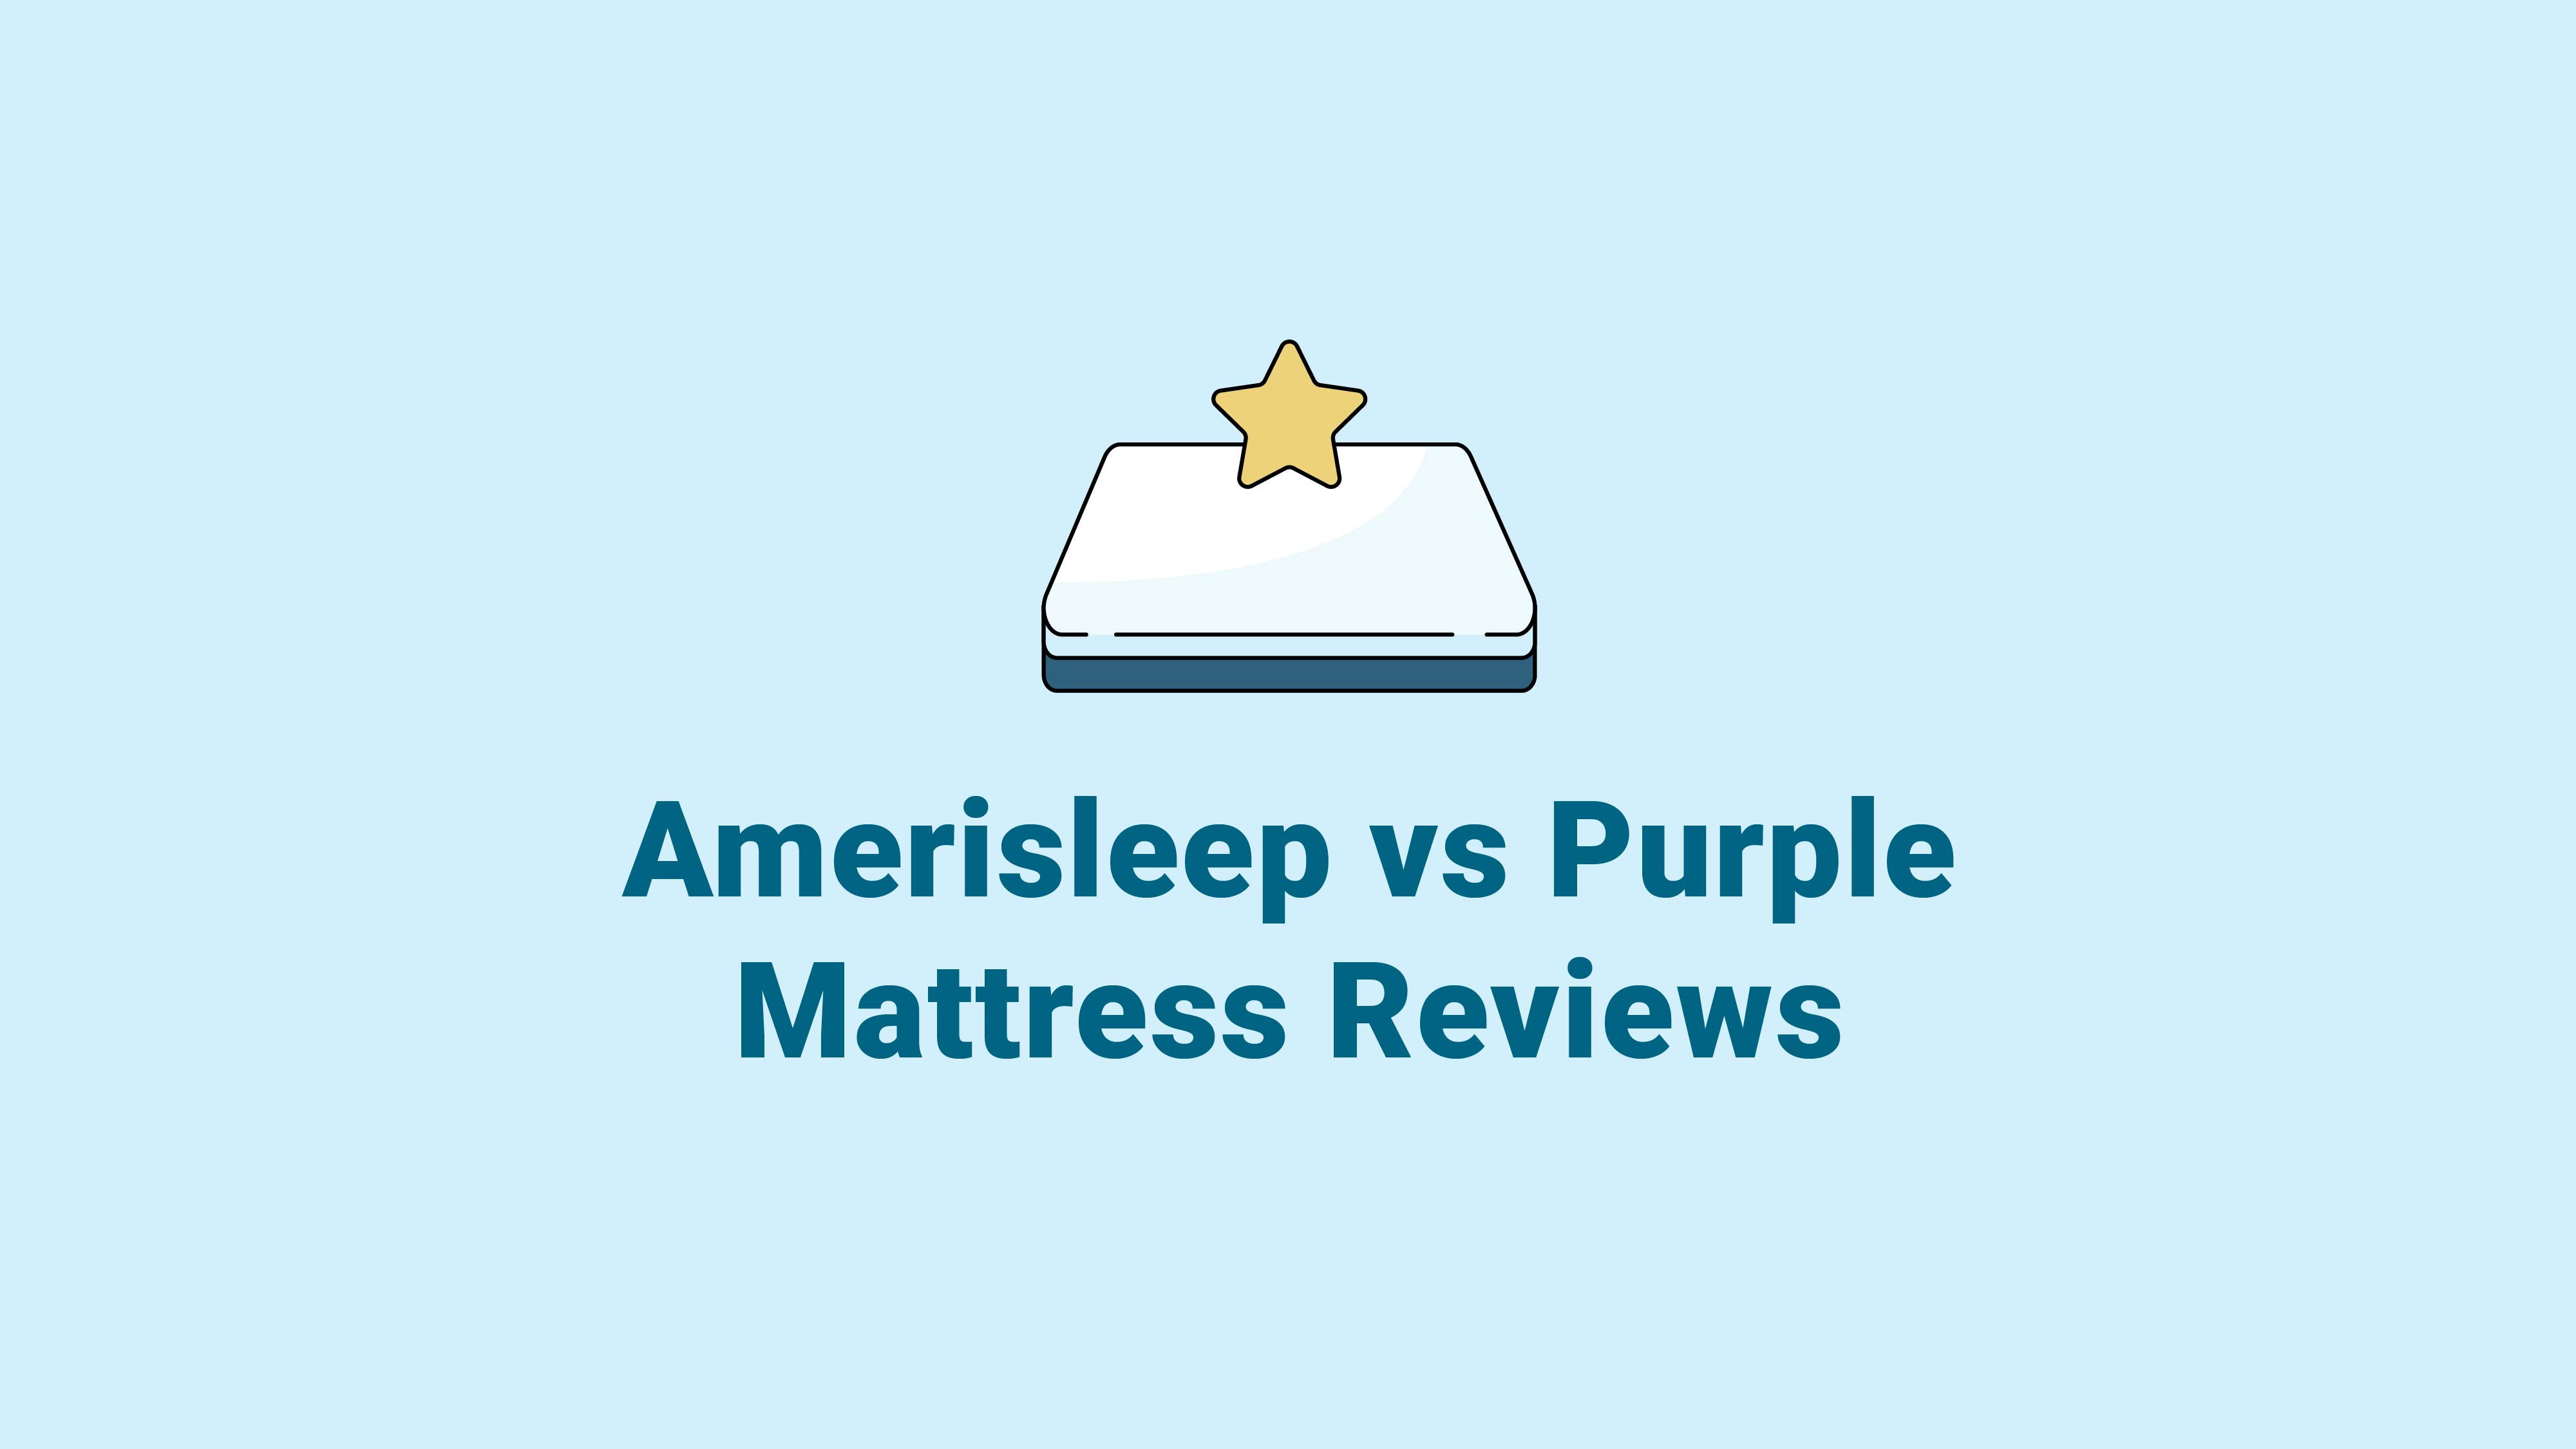 Amerisleep vs. Purple Mattress Reviews